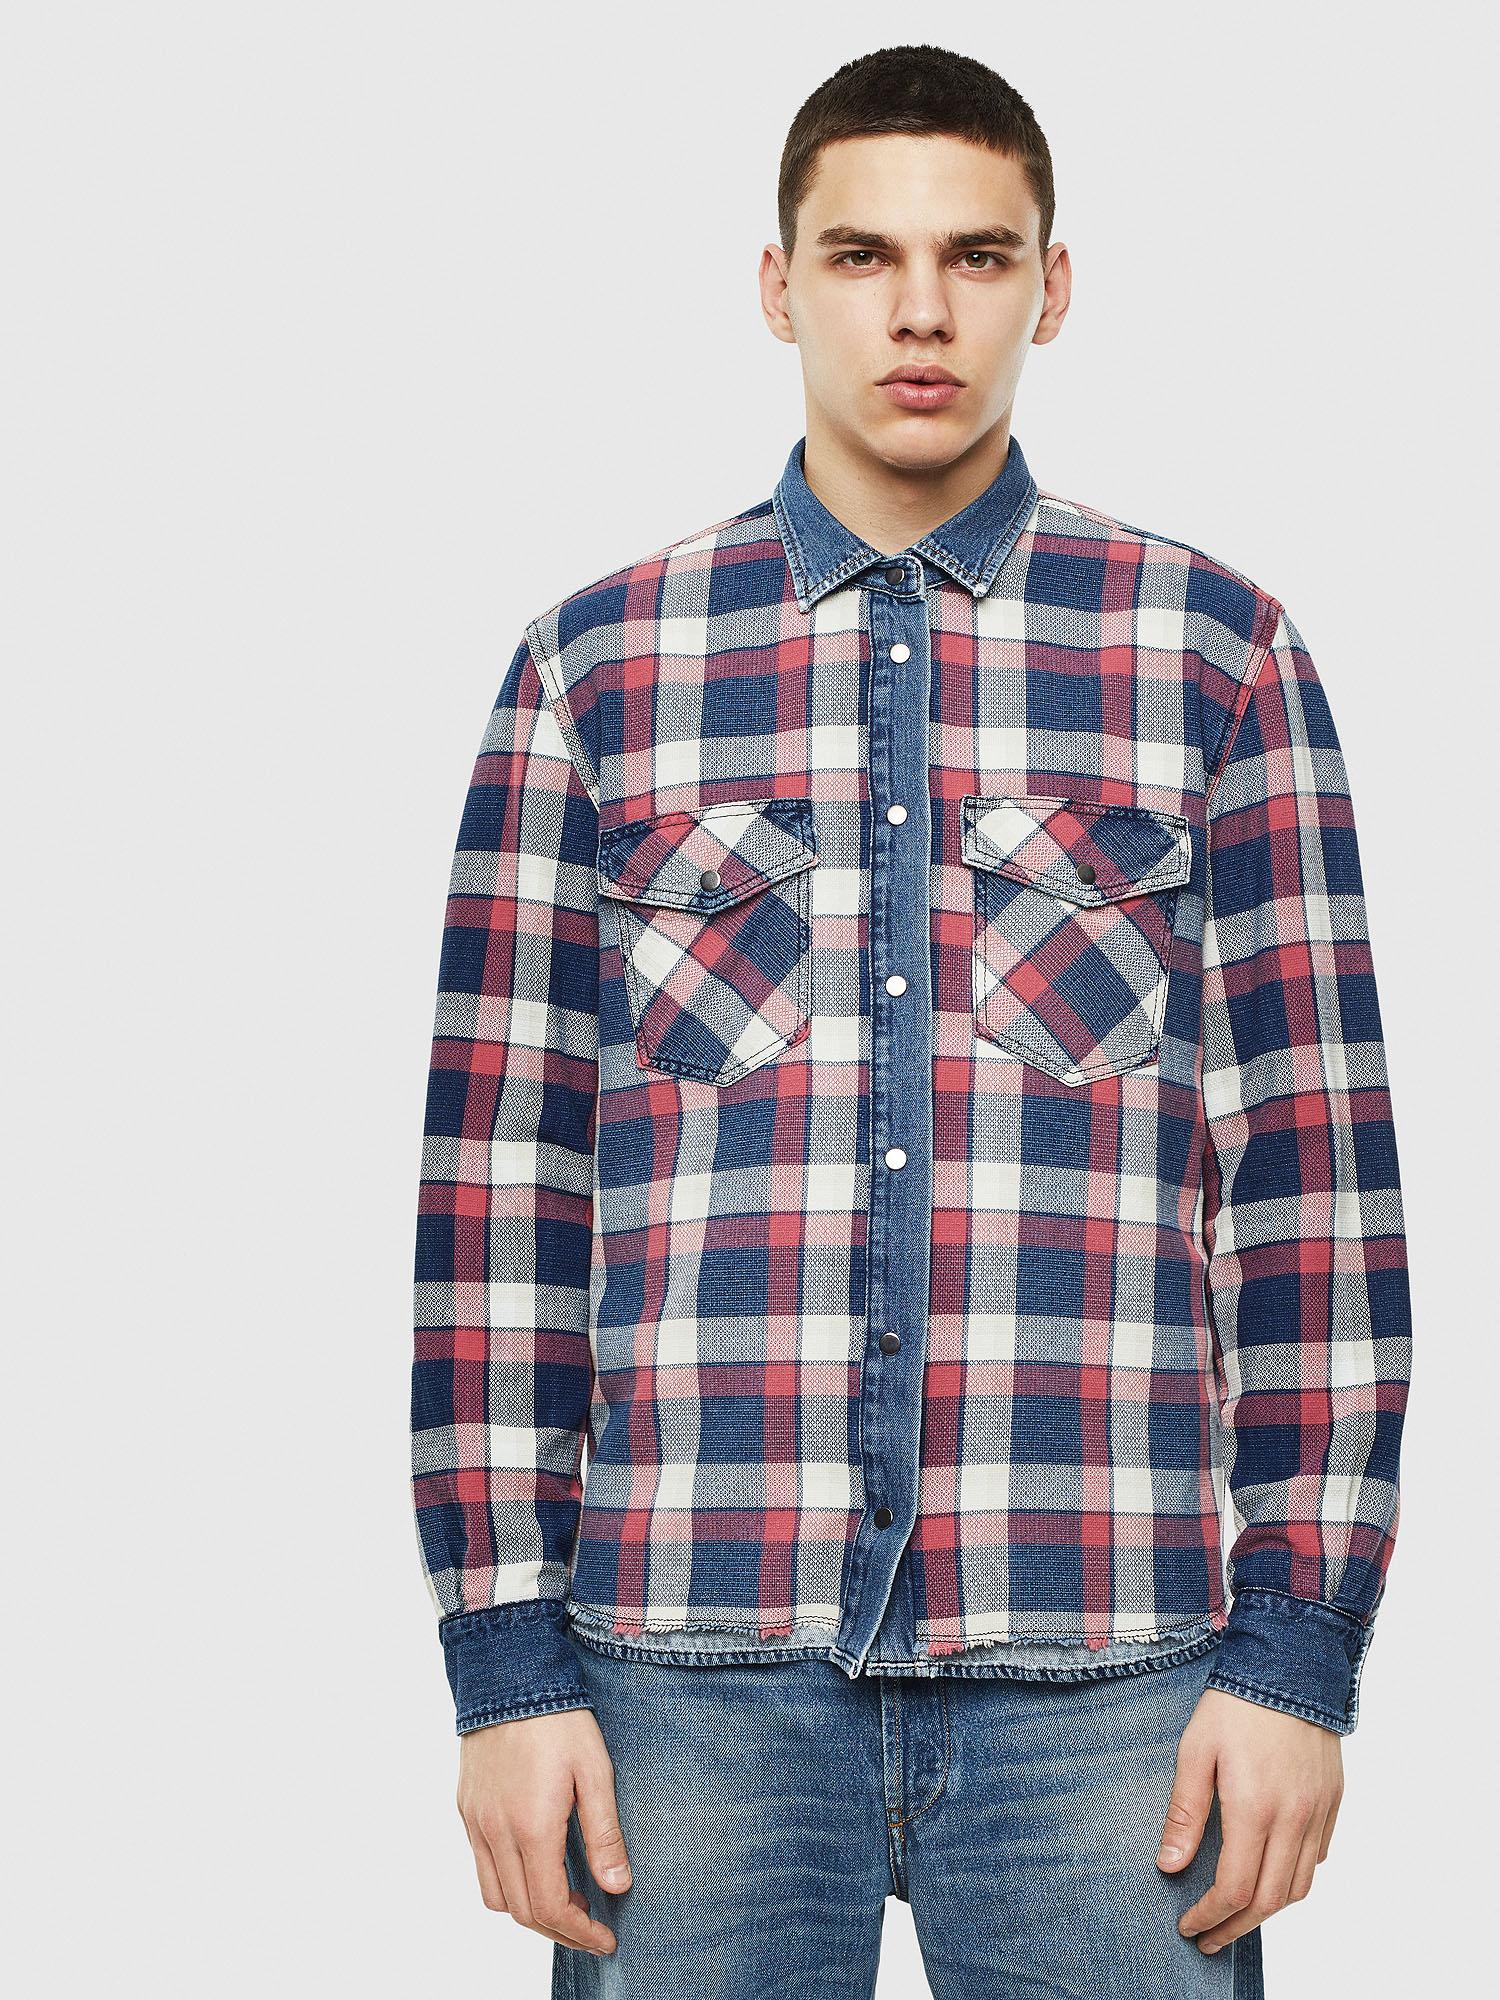 Diesel Denim Shirts 0HAYB - Blue - L